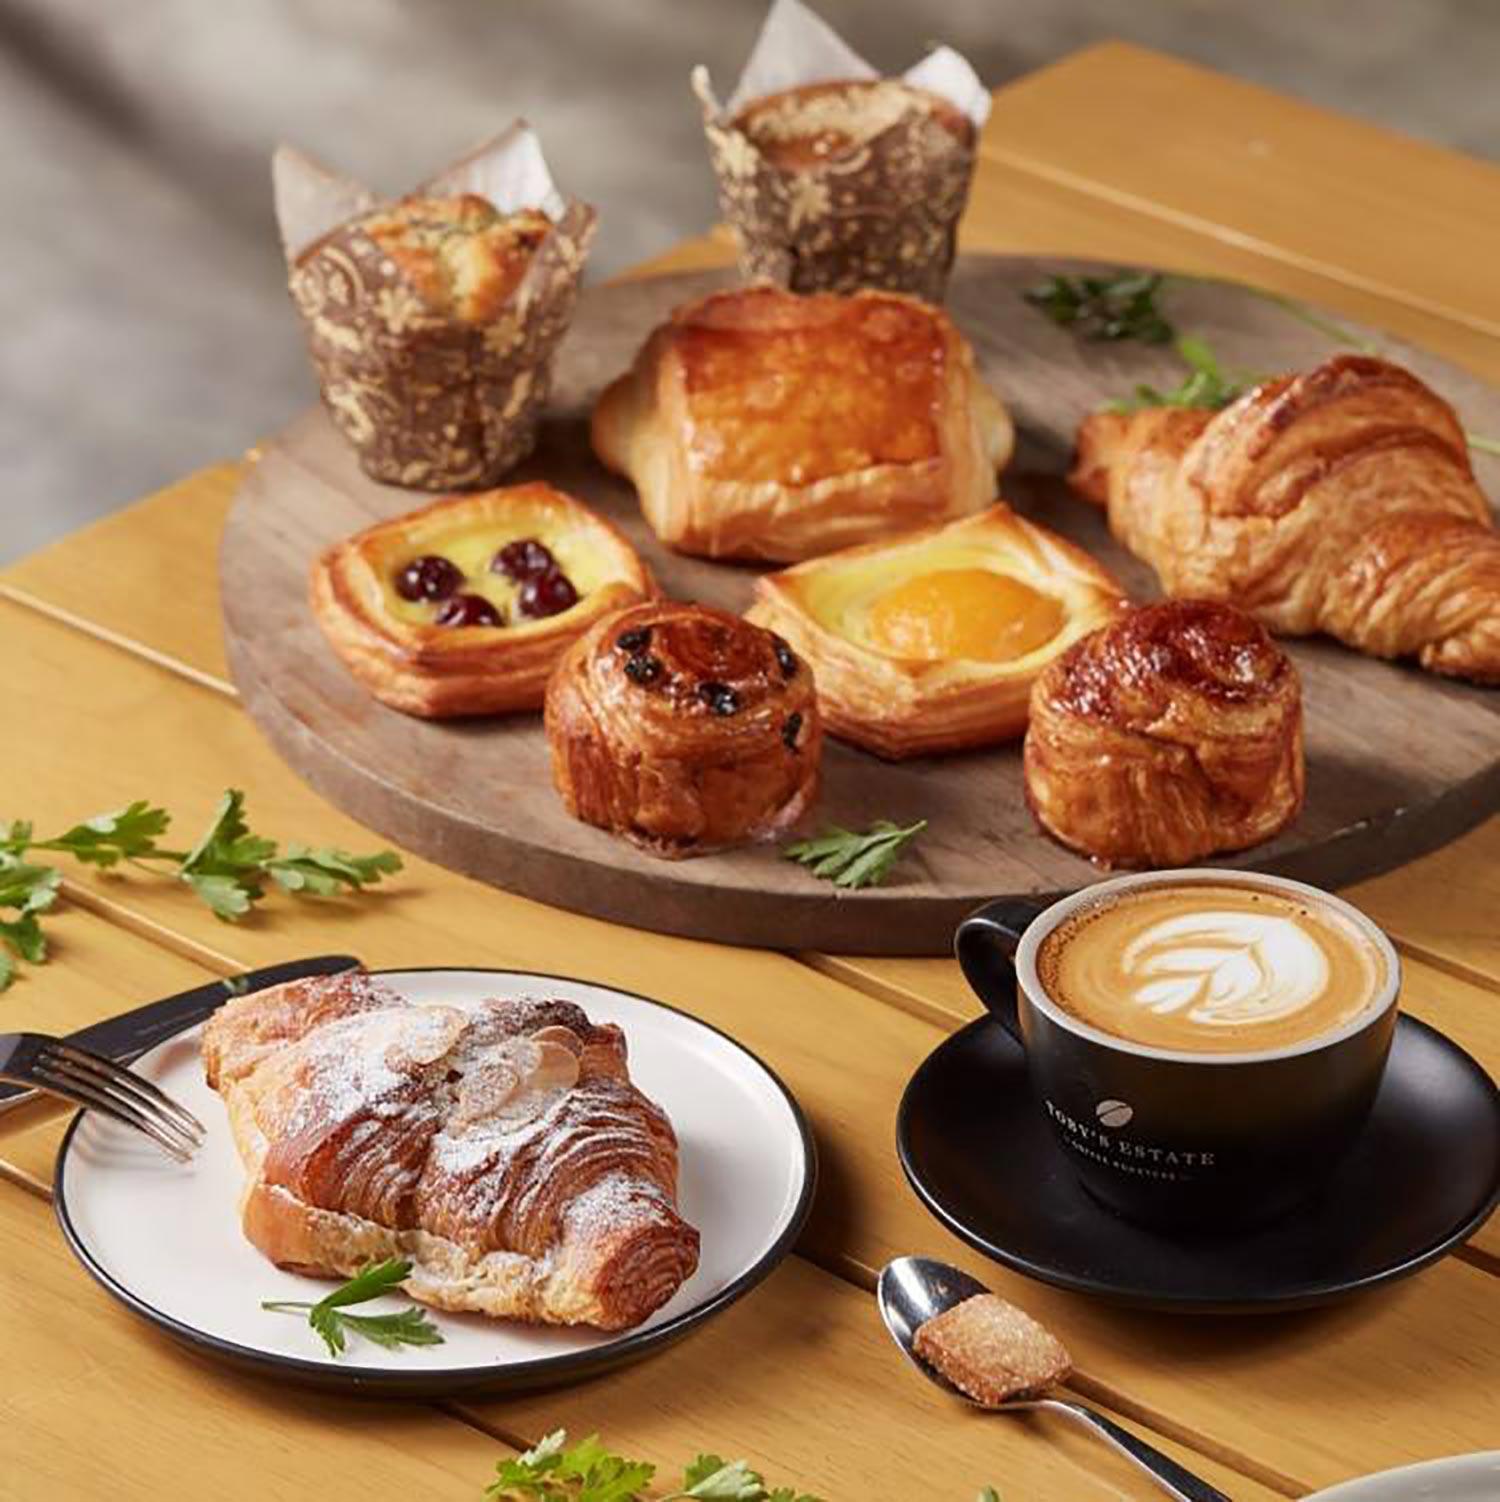 Artisan-Boulangerie-Co.-(ABC)